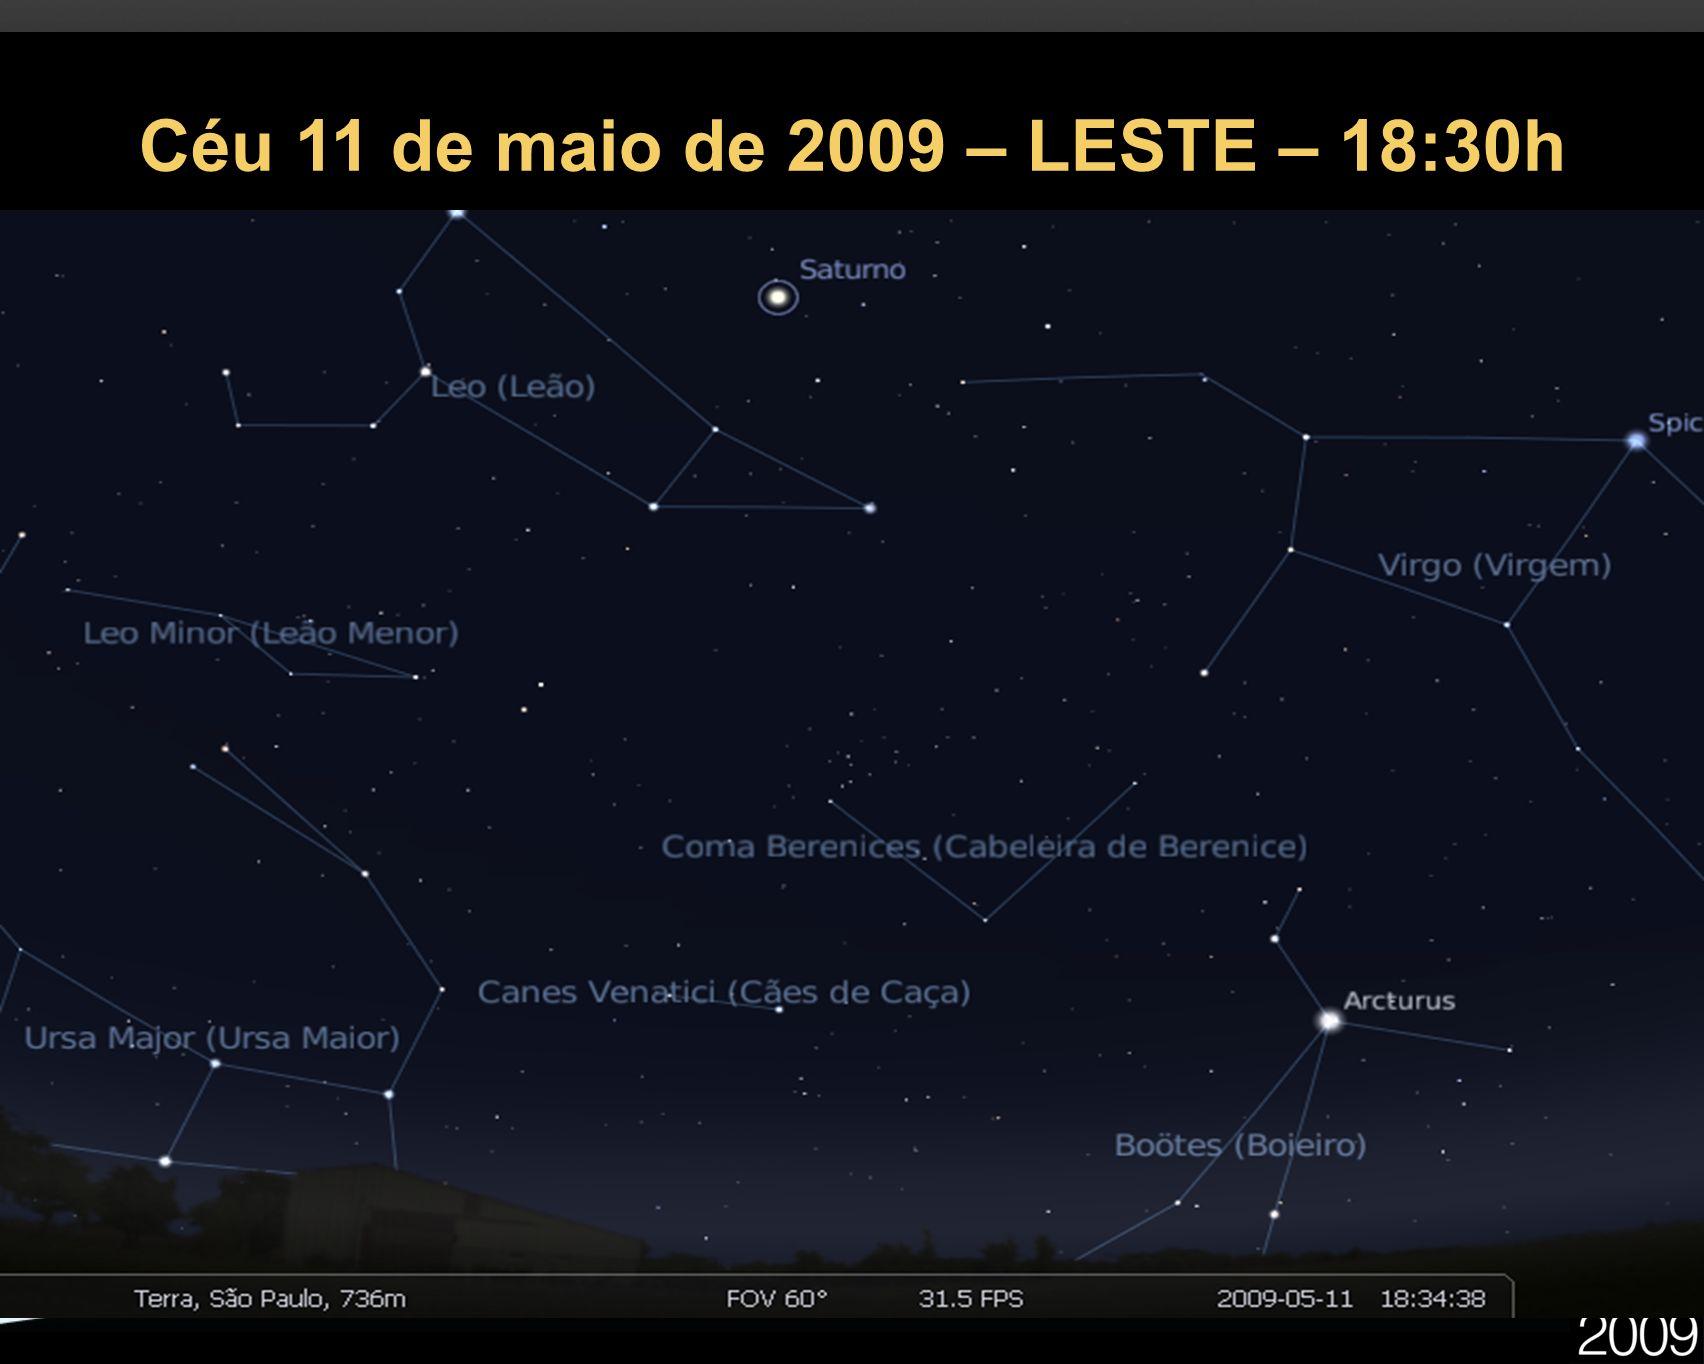 Céu 11 de maio de 2009 – LESTE – 18:30h